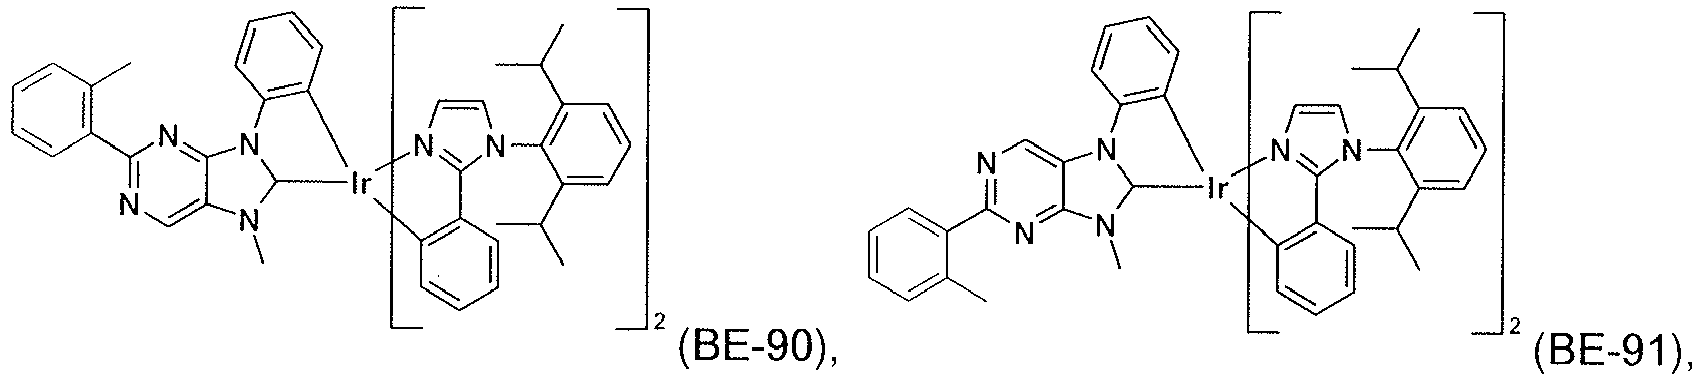 Figure imgb0633